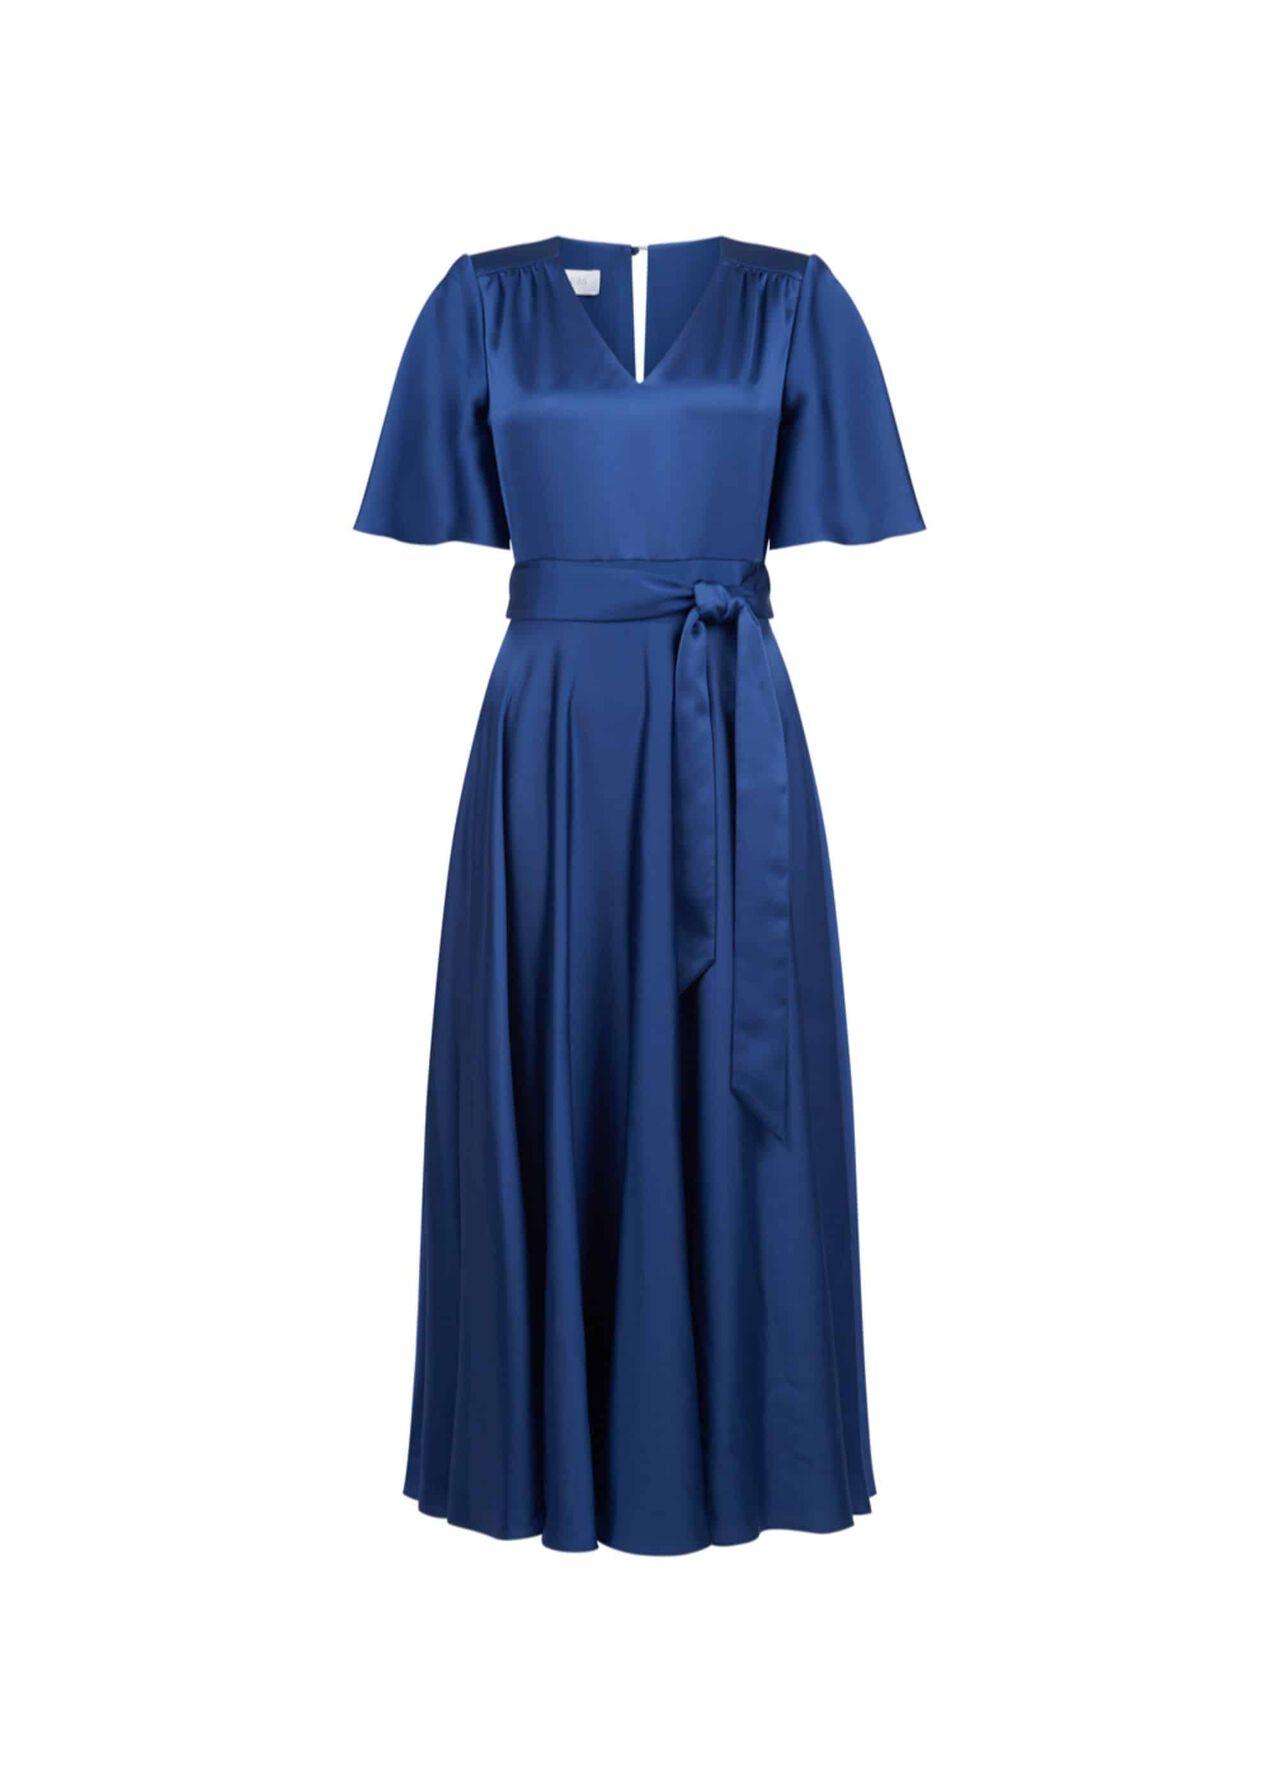 Angelina Satin Dress Regal Blue